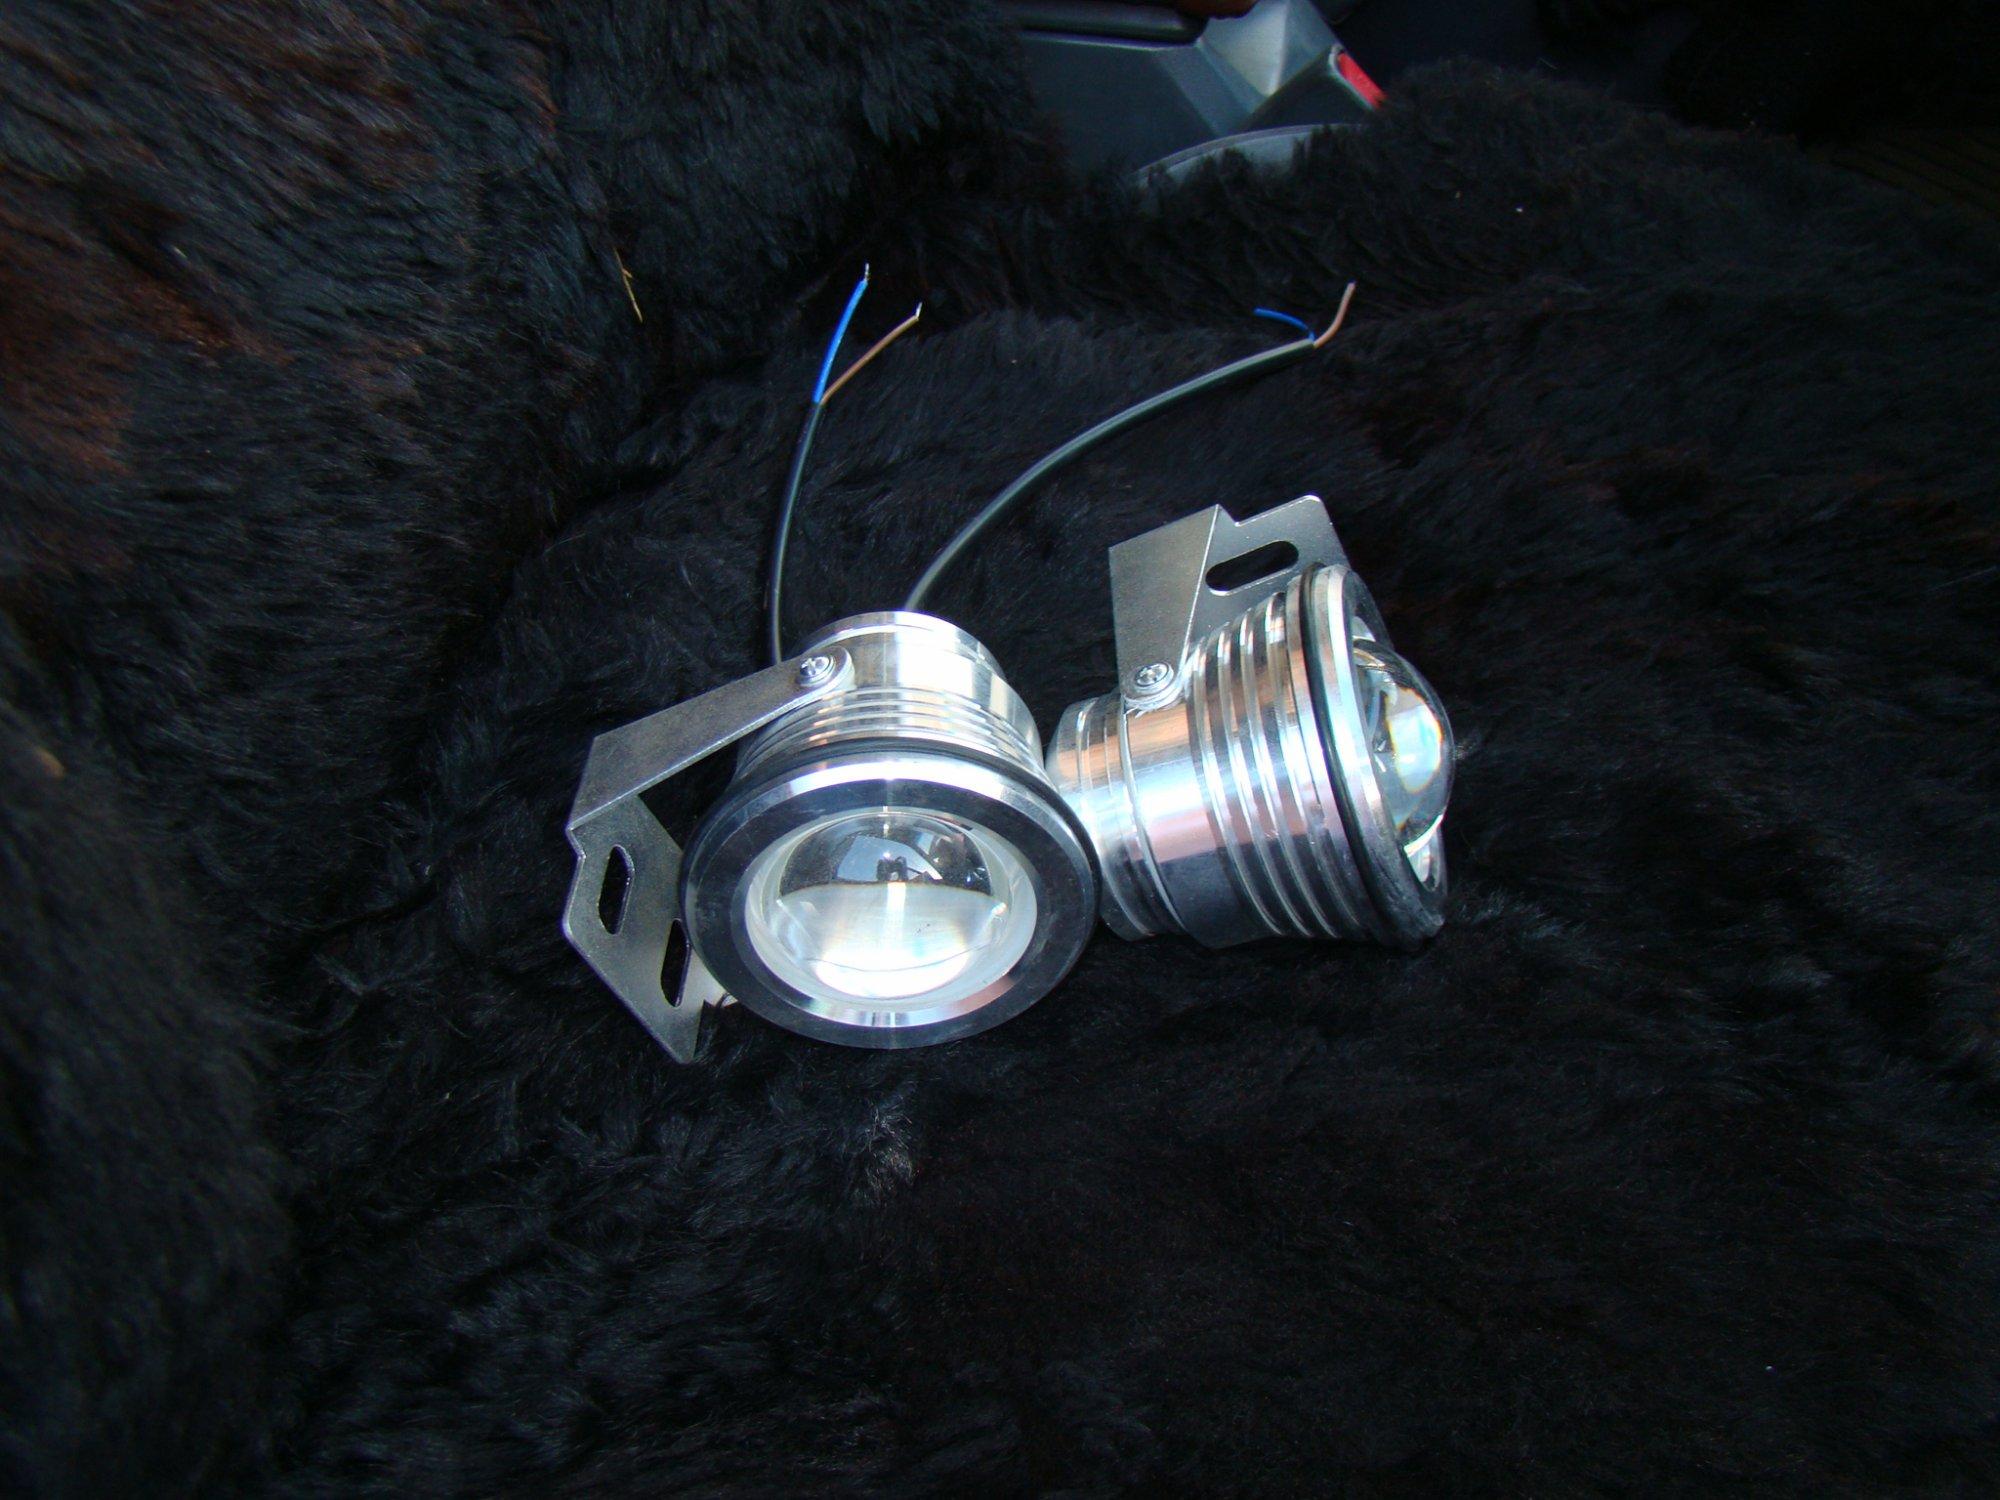 DSC02356.JPG